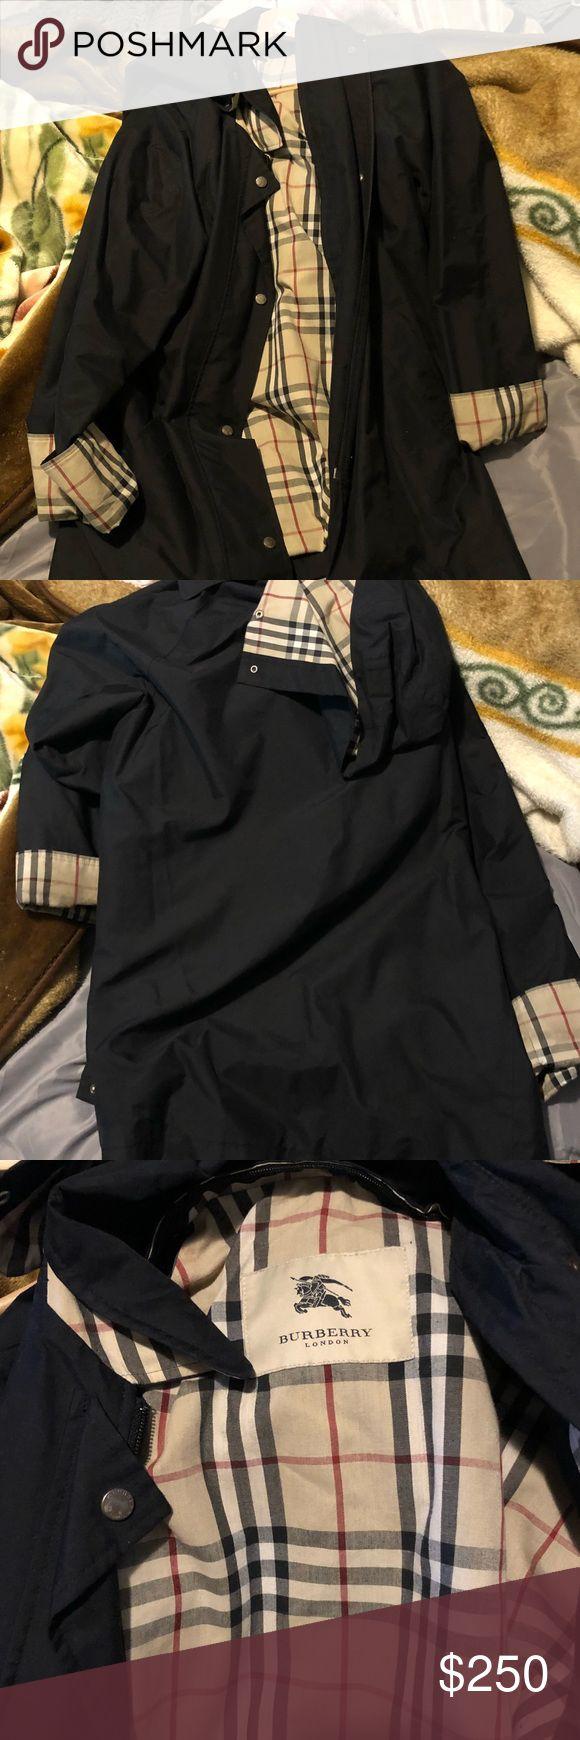 Burberry Rain Coat Woman's medium/large. Too big on me! Burberry Jackets & Coats Trench Coats